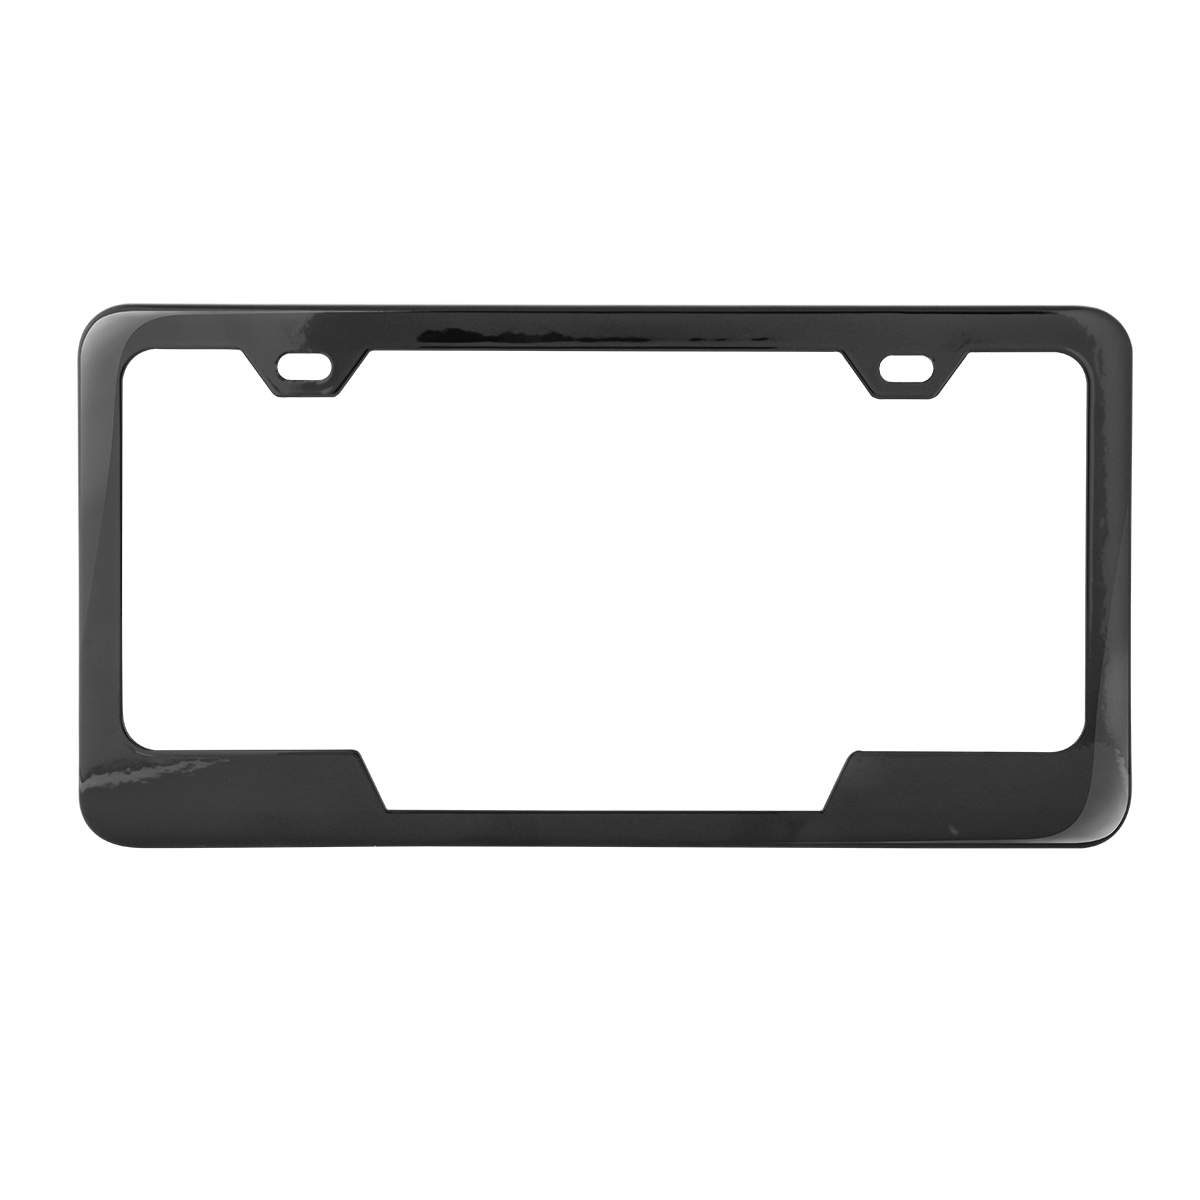 60407 Plain 2-Hole License Plate Frames with Center Cut